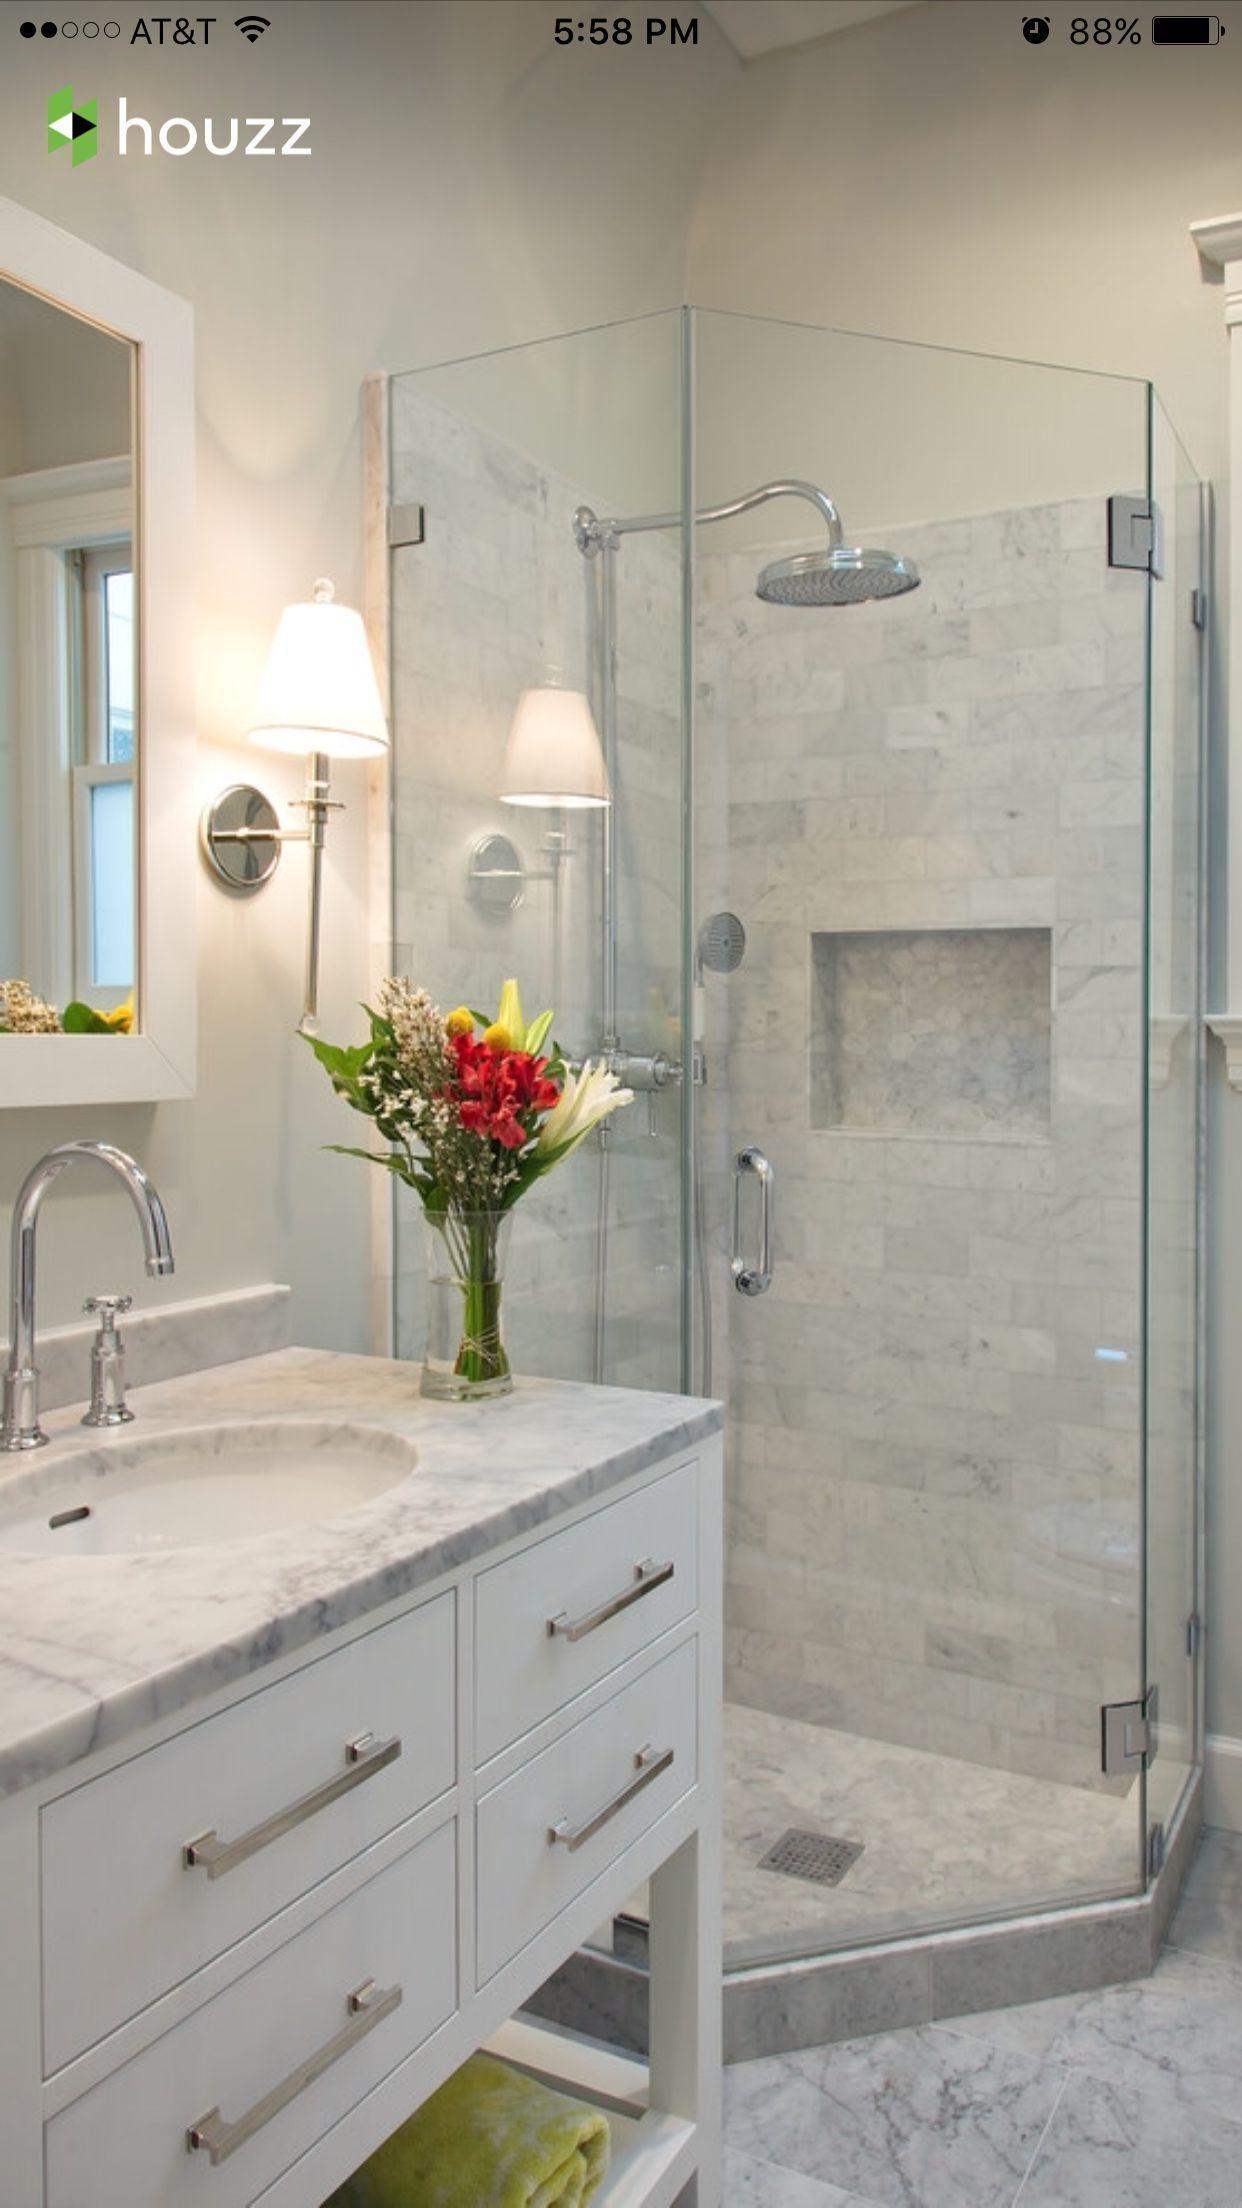 Bathroom Remodelling  Make a splash with your own bathroom